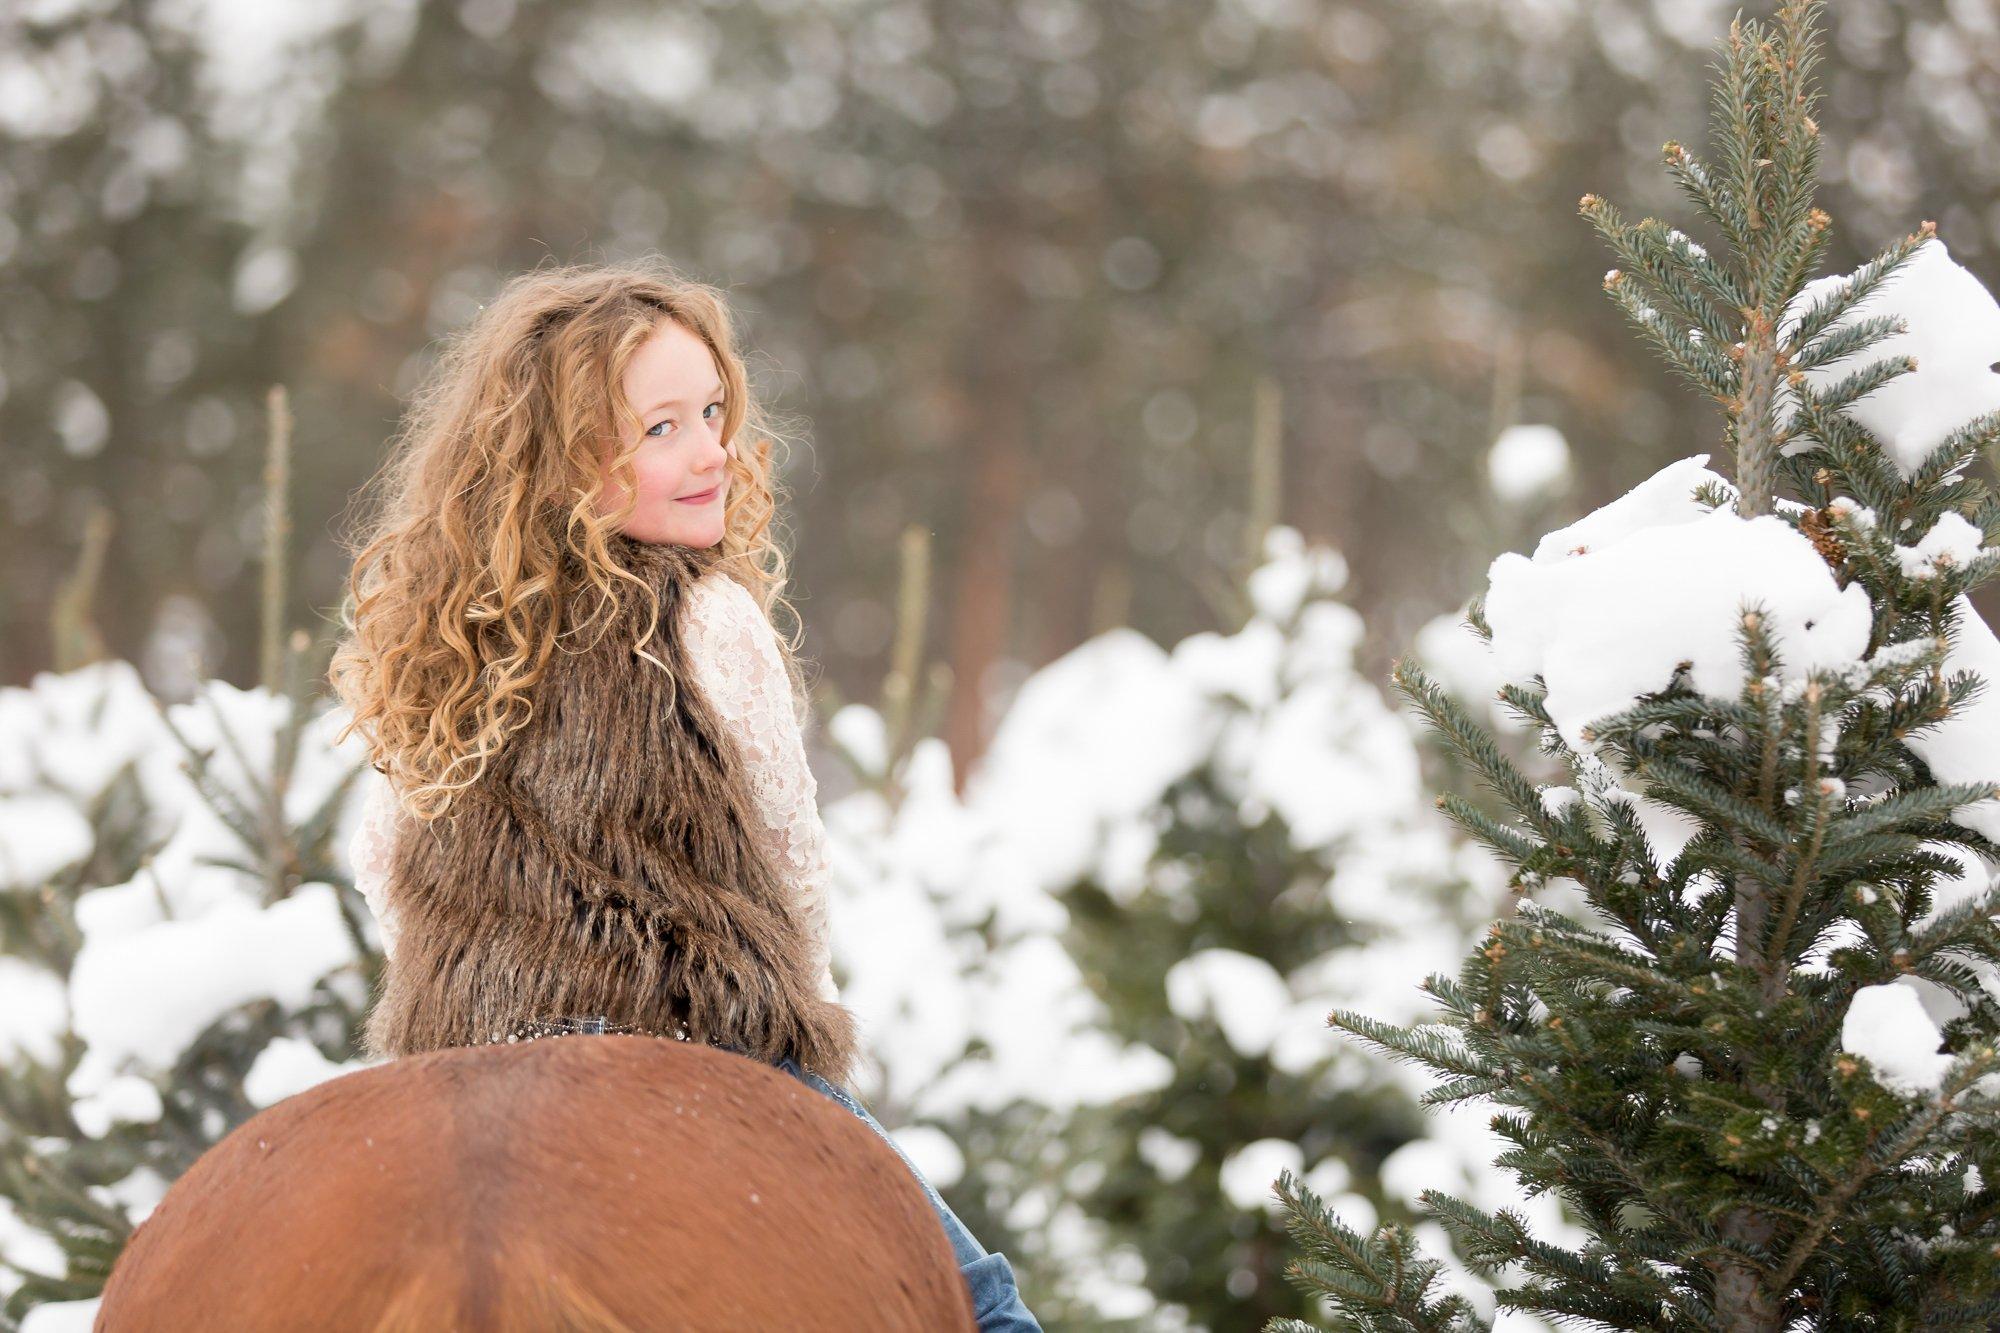 A girl sitting on her horse bareback